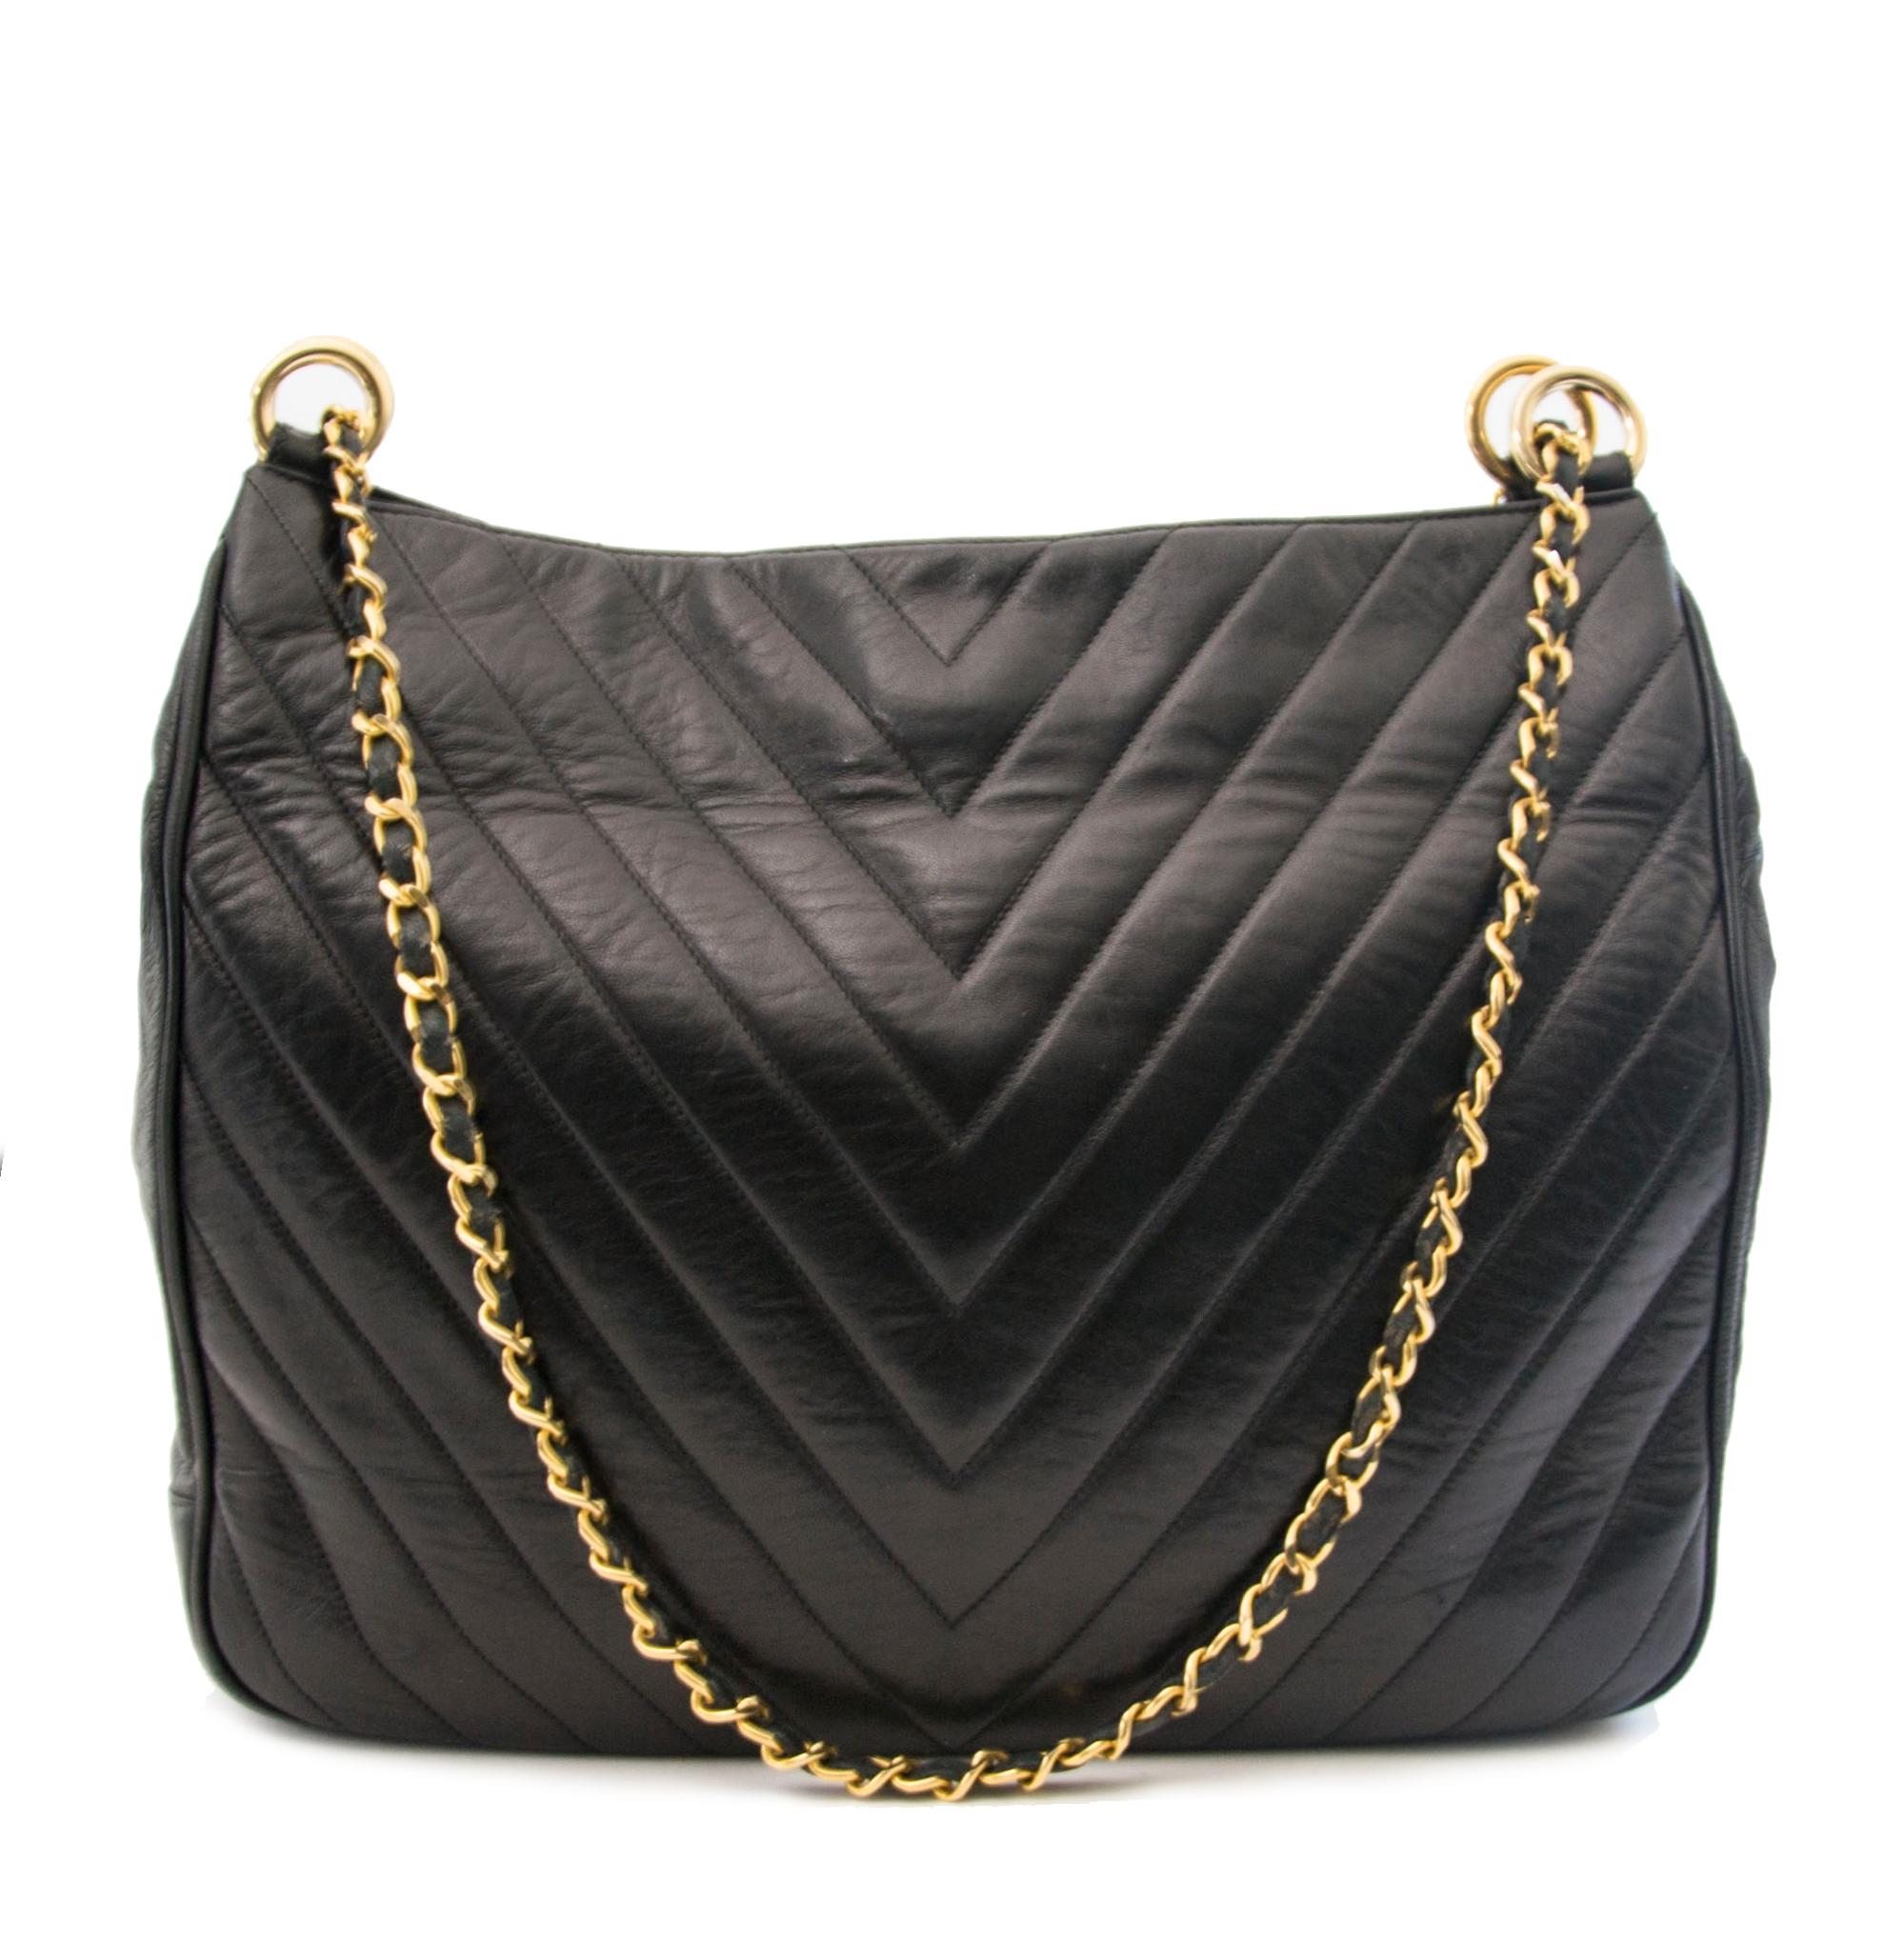 d89a85f6bfd6 ... koop online tegen de beste prijs Chanel Vintage Black Cheveron  Shoulderbag